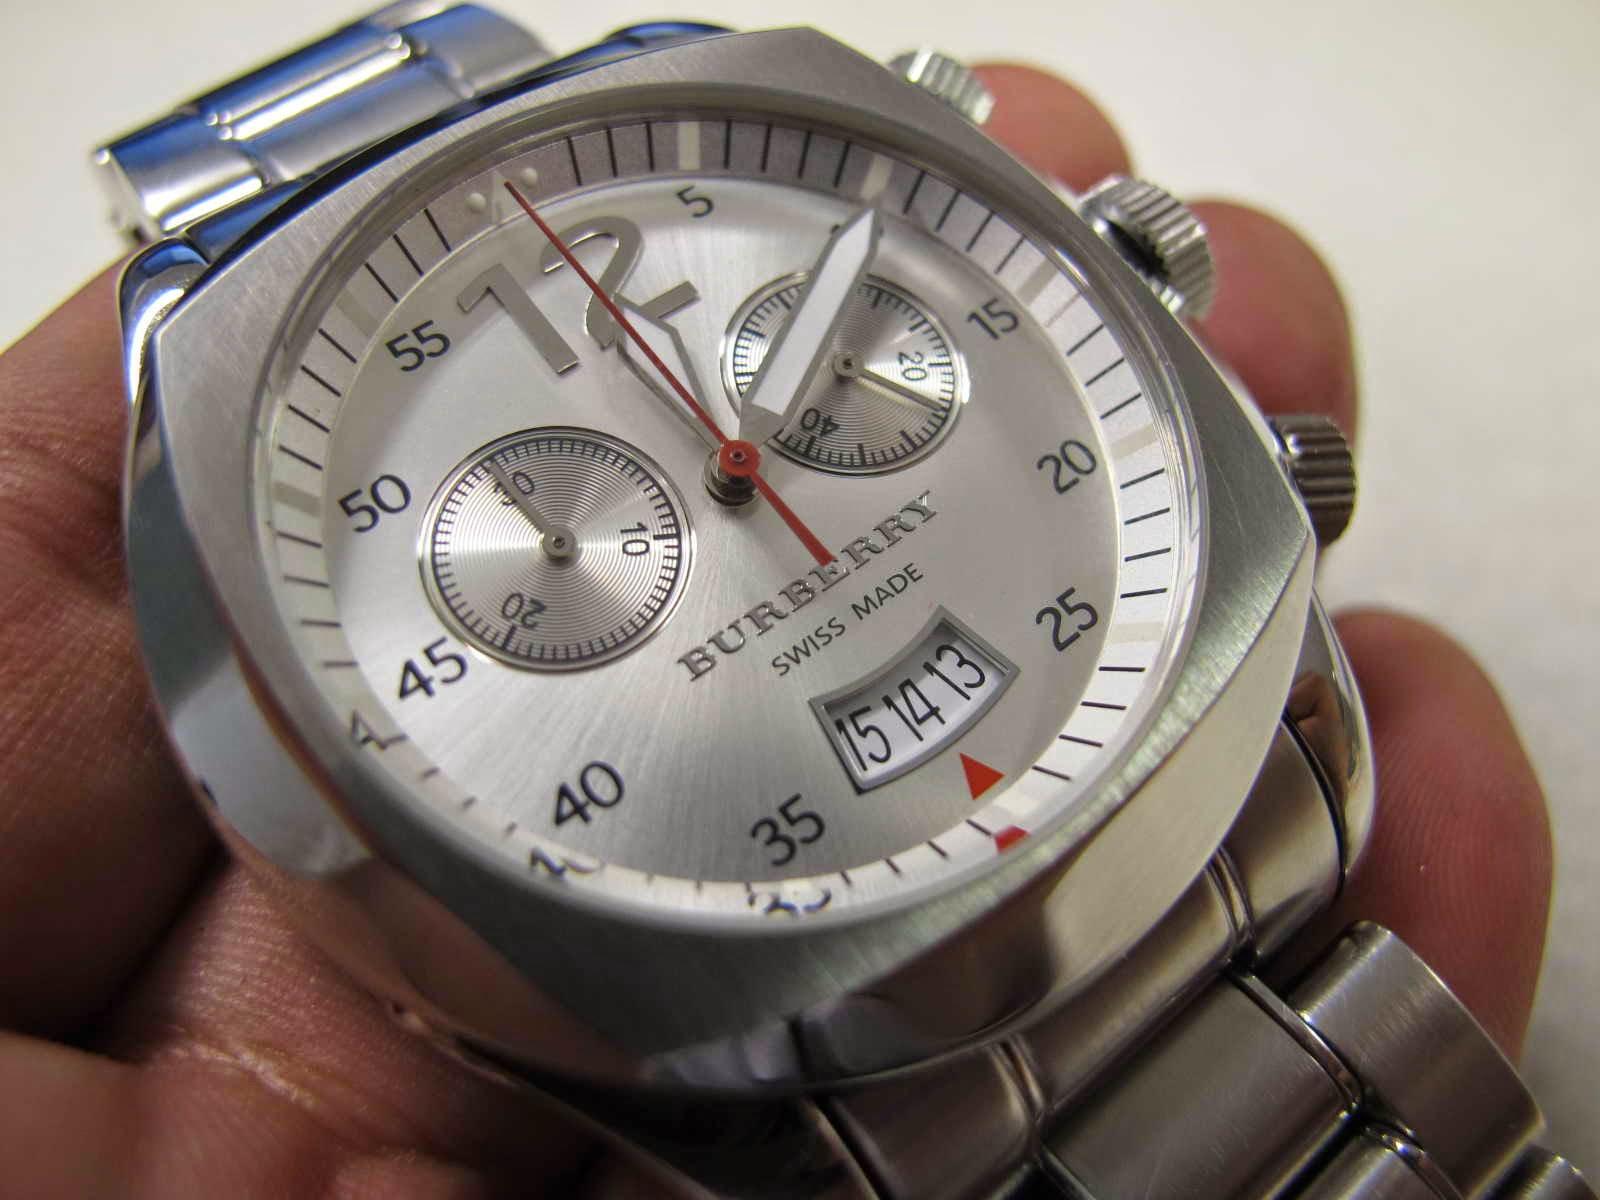 Maximuswatches Jual Beli Jam Tangan Second-Baru Original-Koleksi Jam ... 2e43551d2a